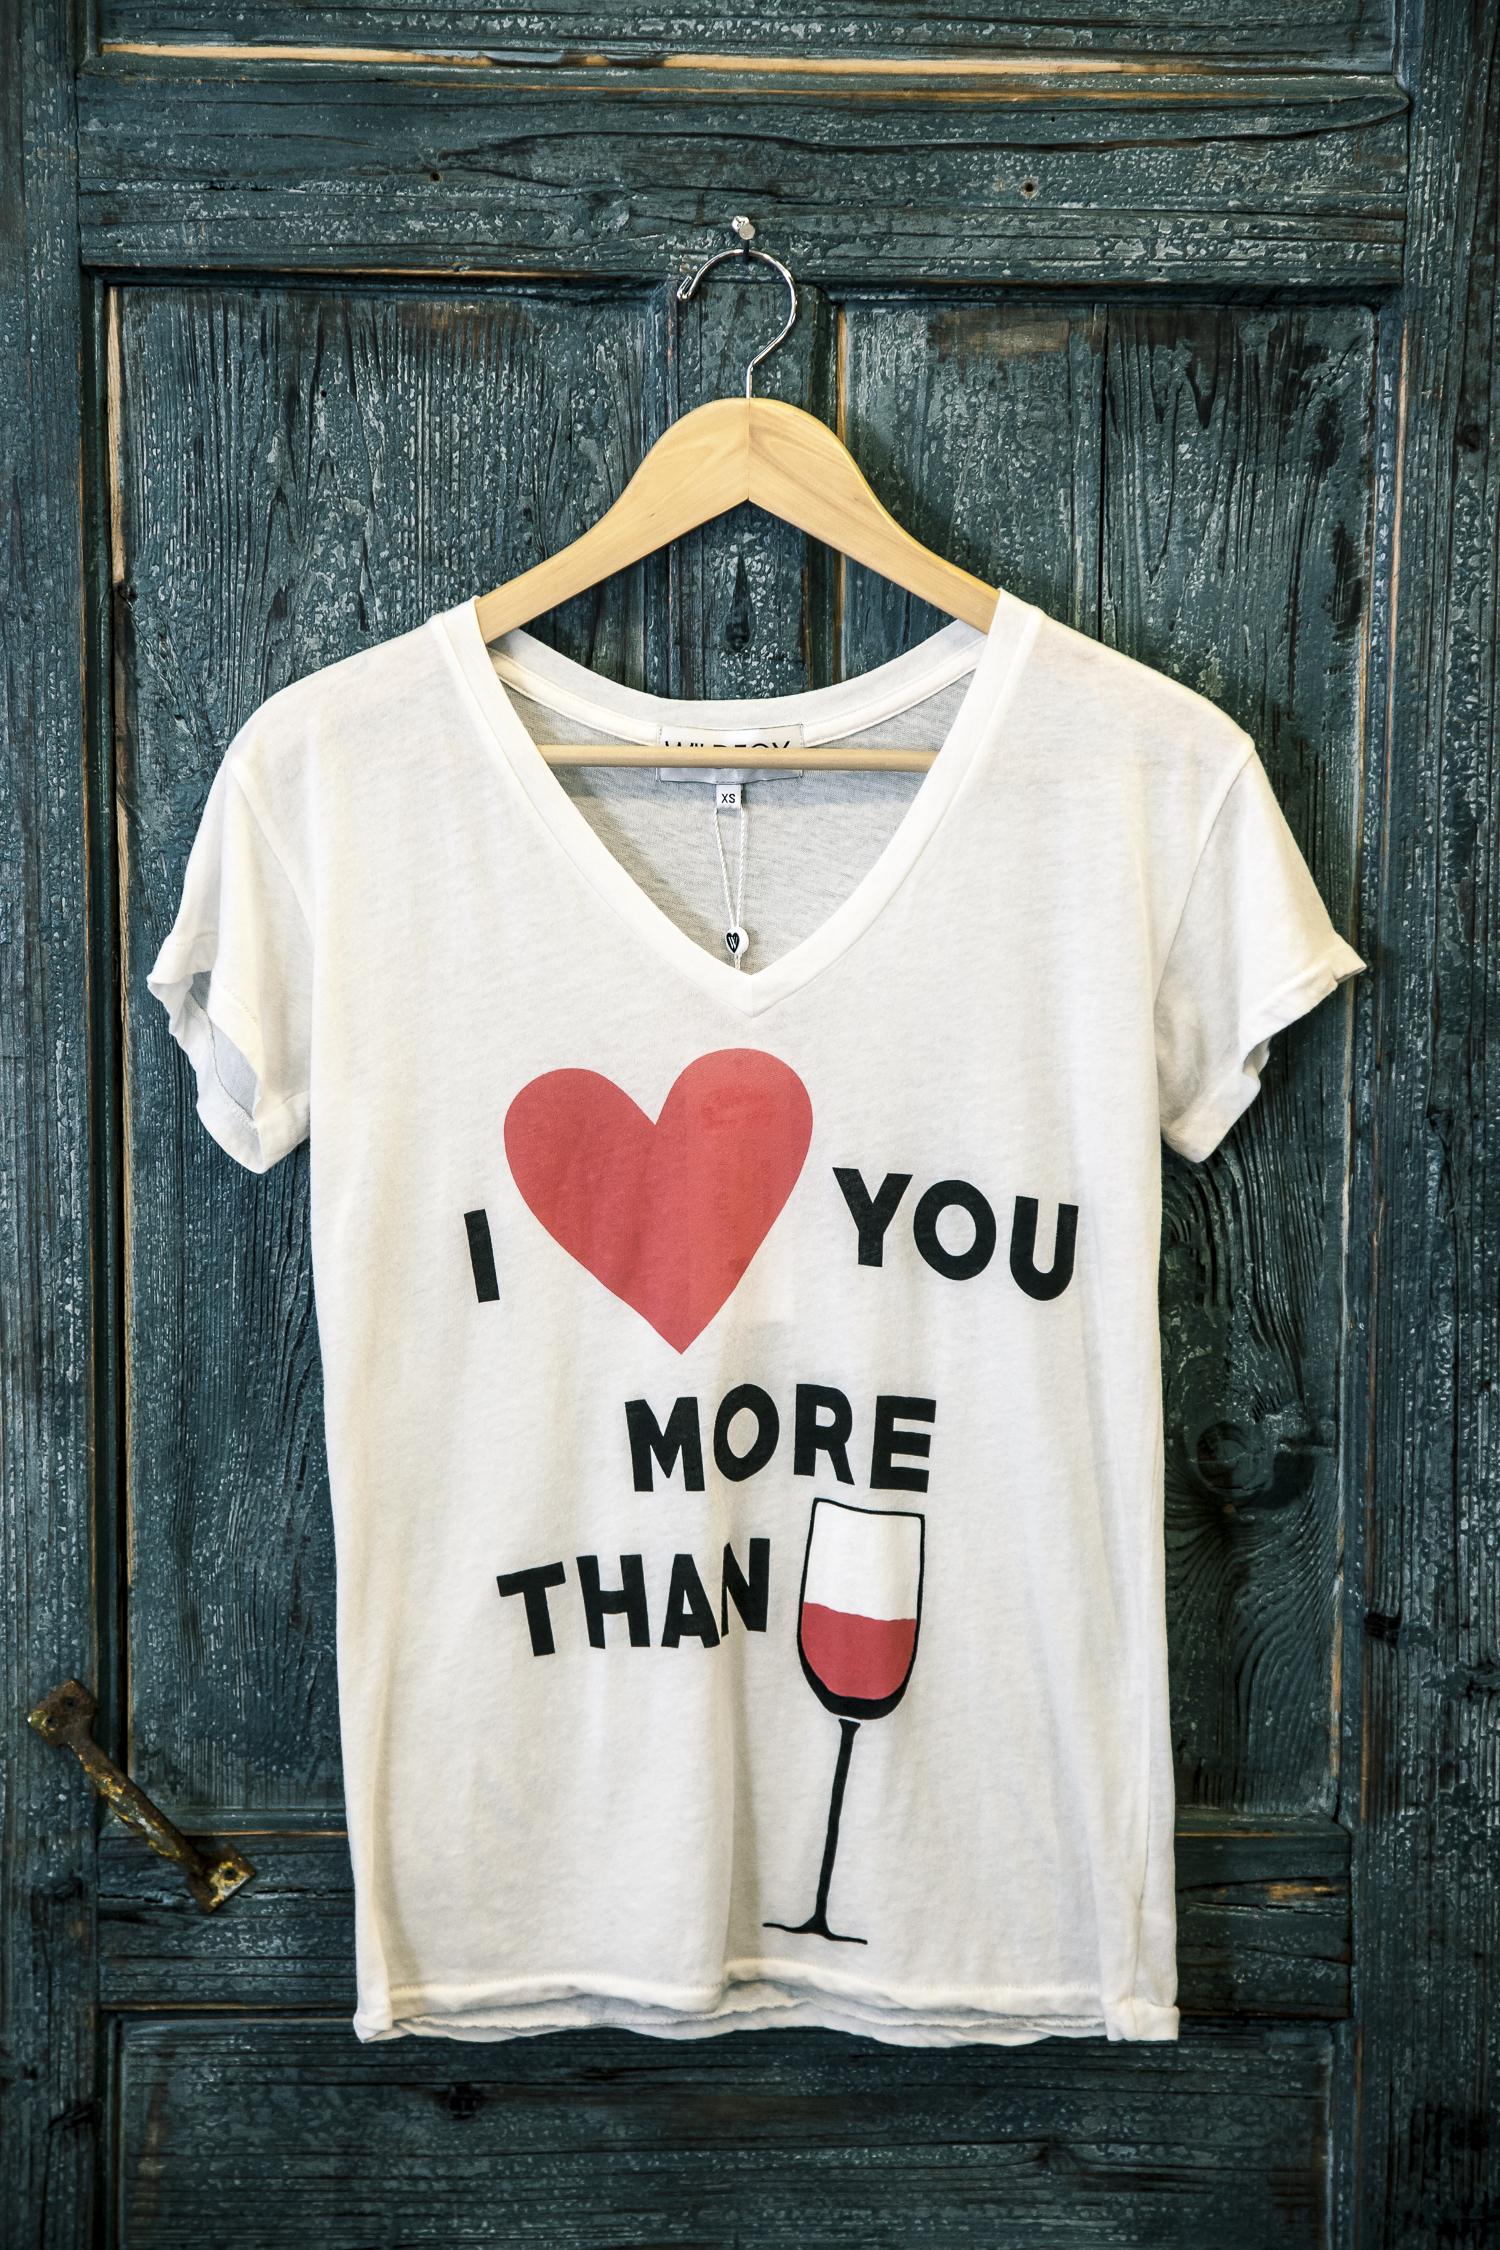 BellaMaas-tshirt-printed-rocker-style-gift-valentines-day